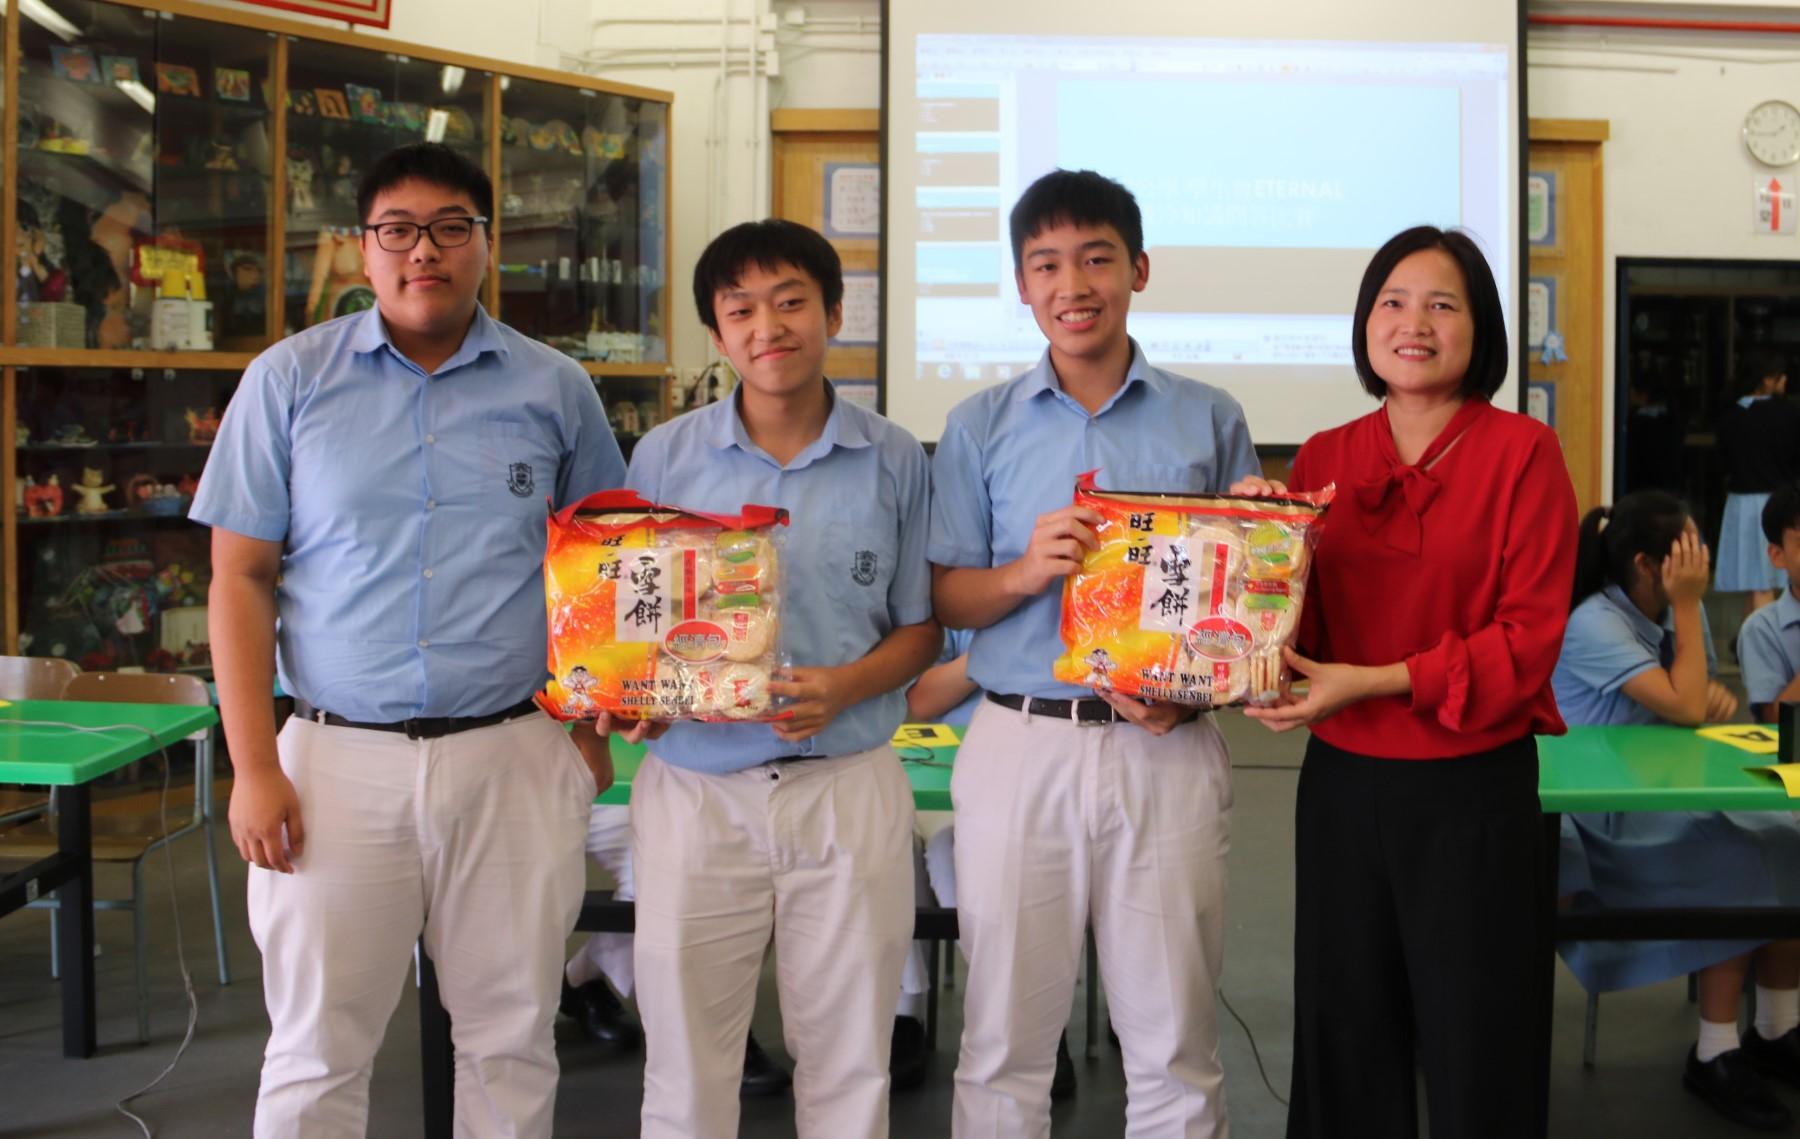 http://npc.edu.hk/sites/default/files/img_6281.jpg